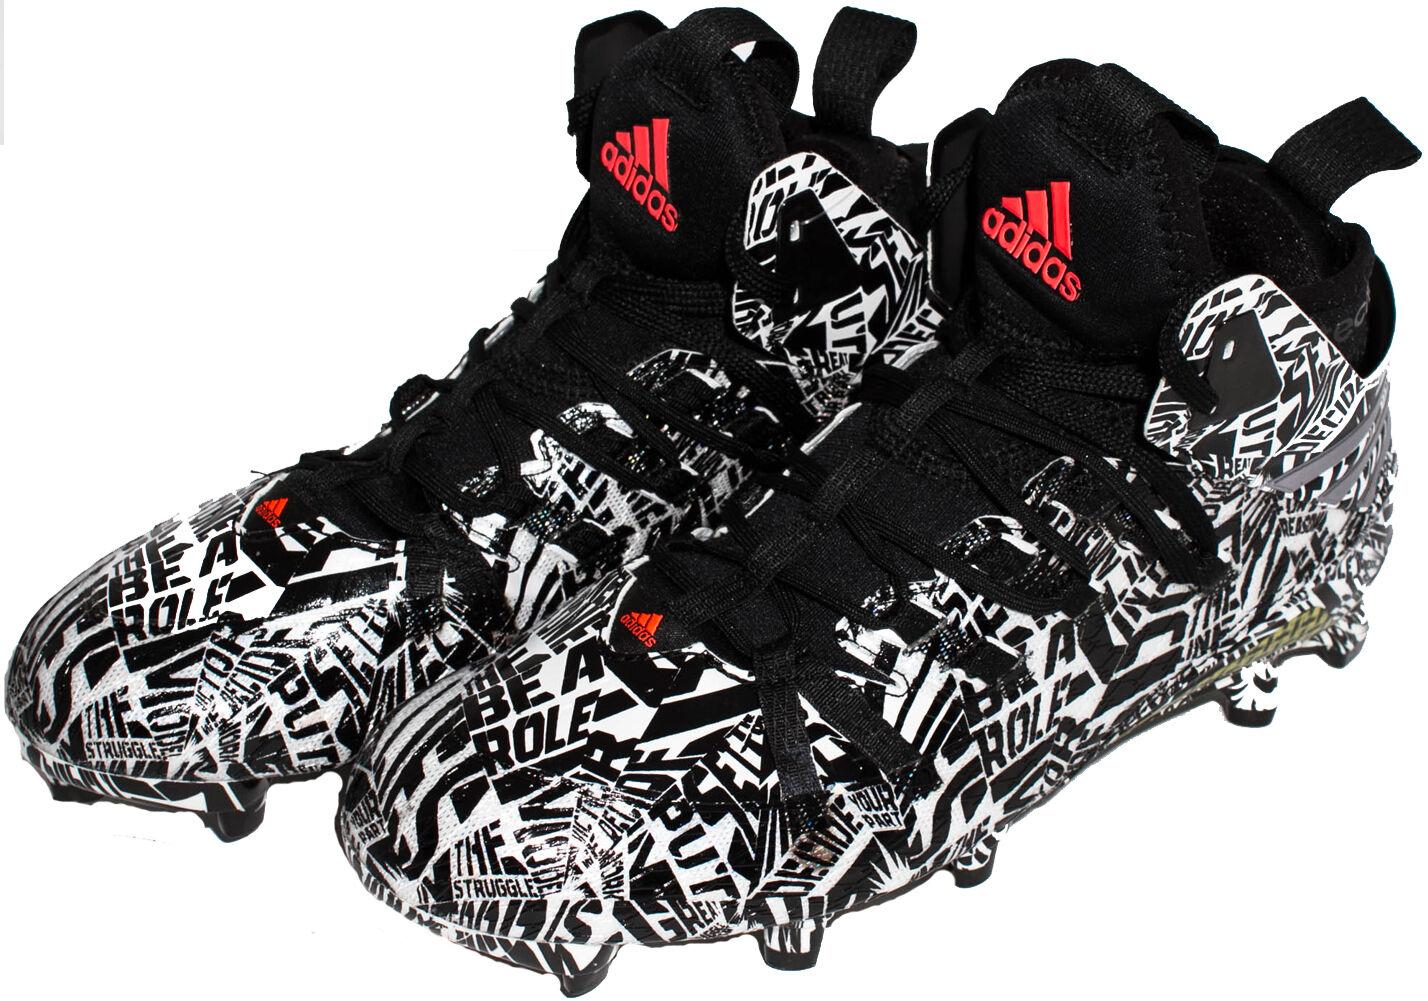 Adidas Freak x Kevlar Football shoes Black White S84030 Sz 7 - 11.5